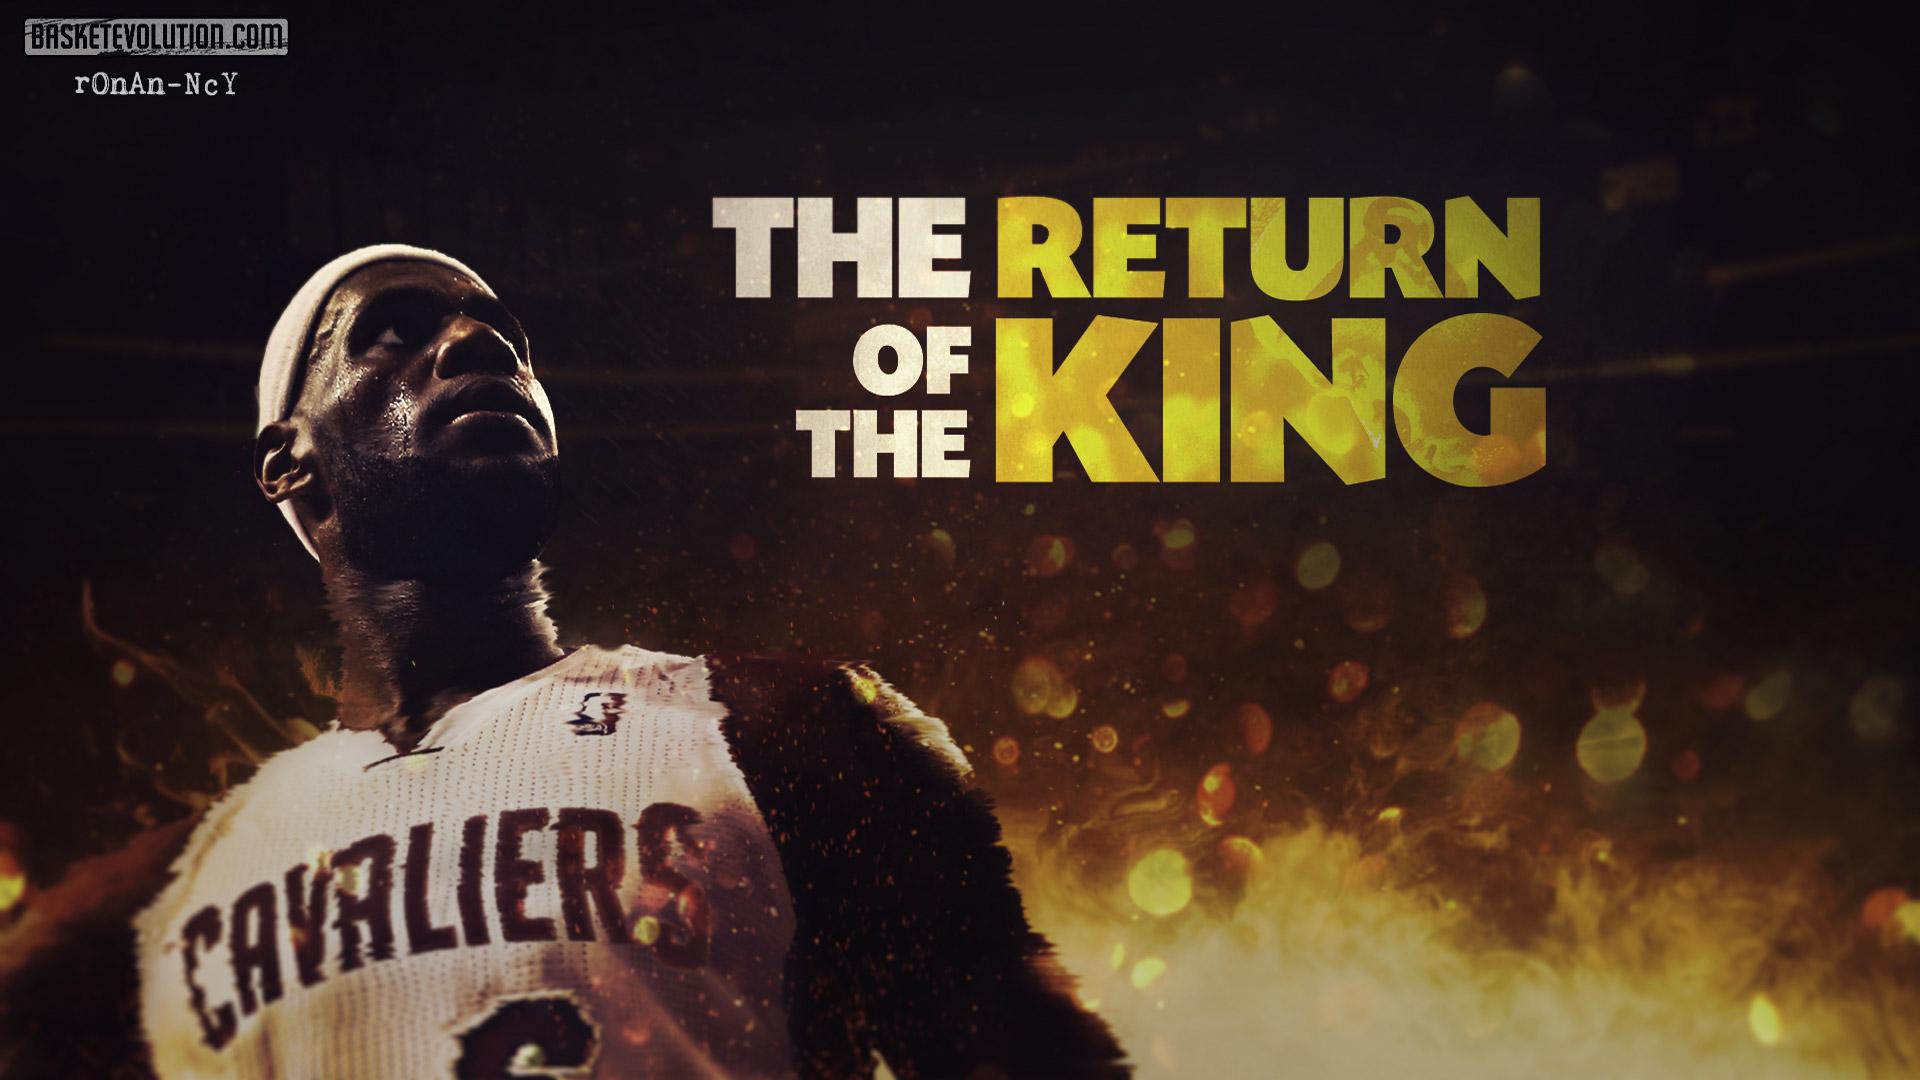 Wallpapers LeBron James Return Cavaliers 2014 Wallpaper 1920x1080